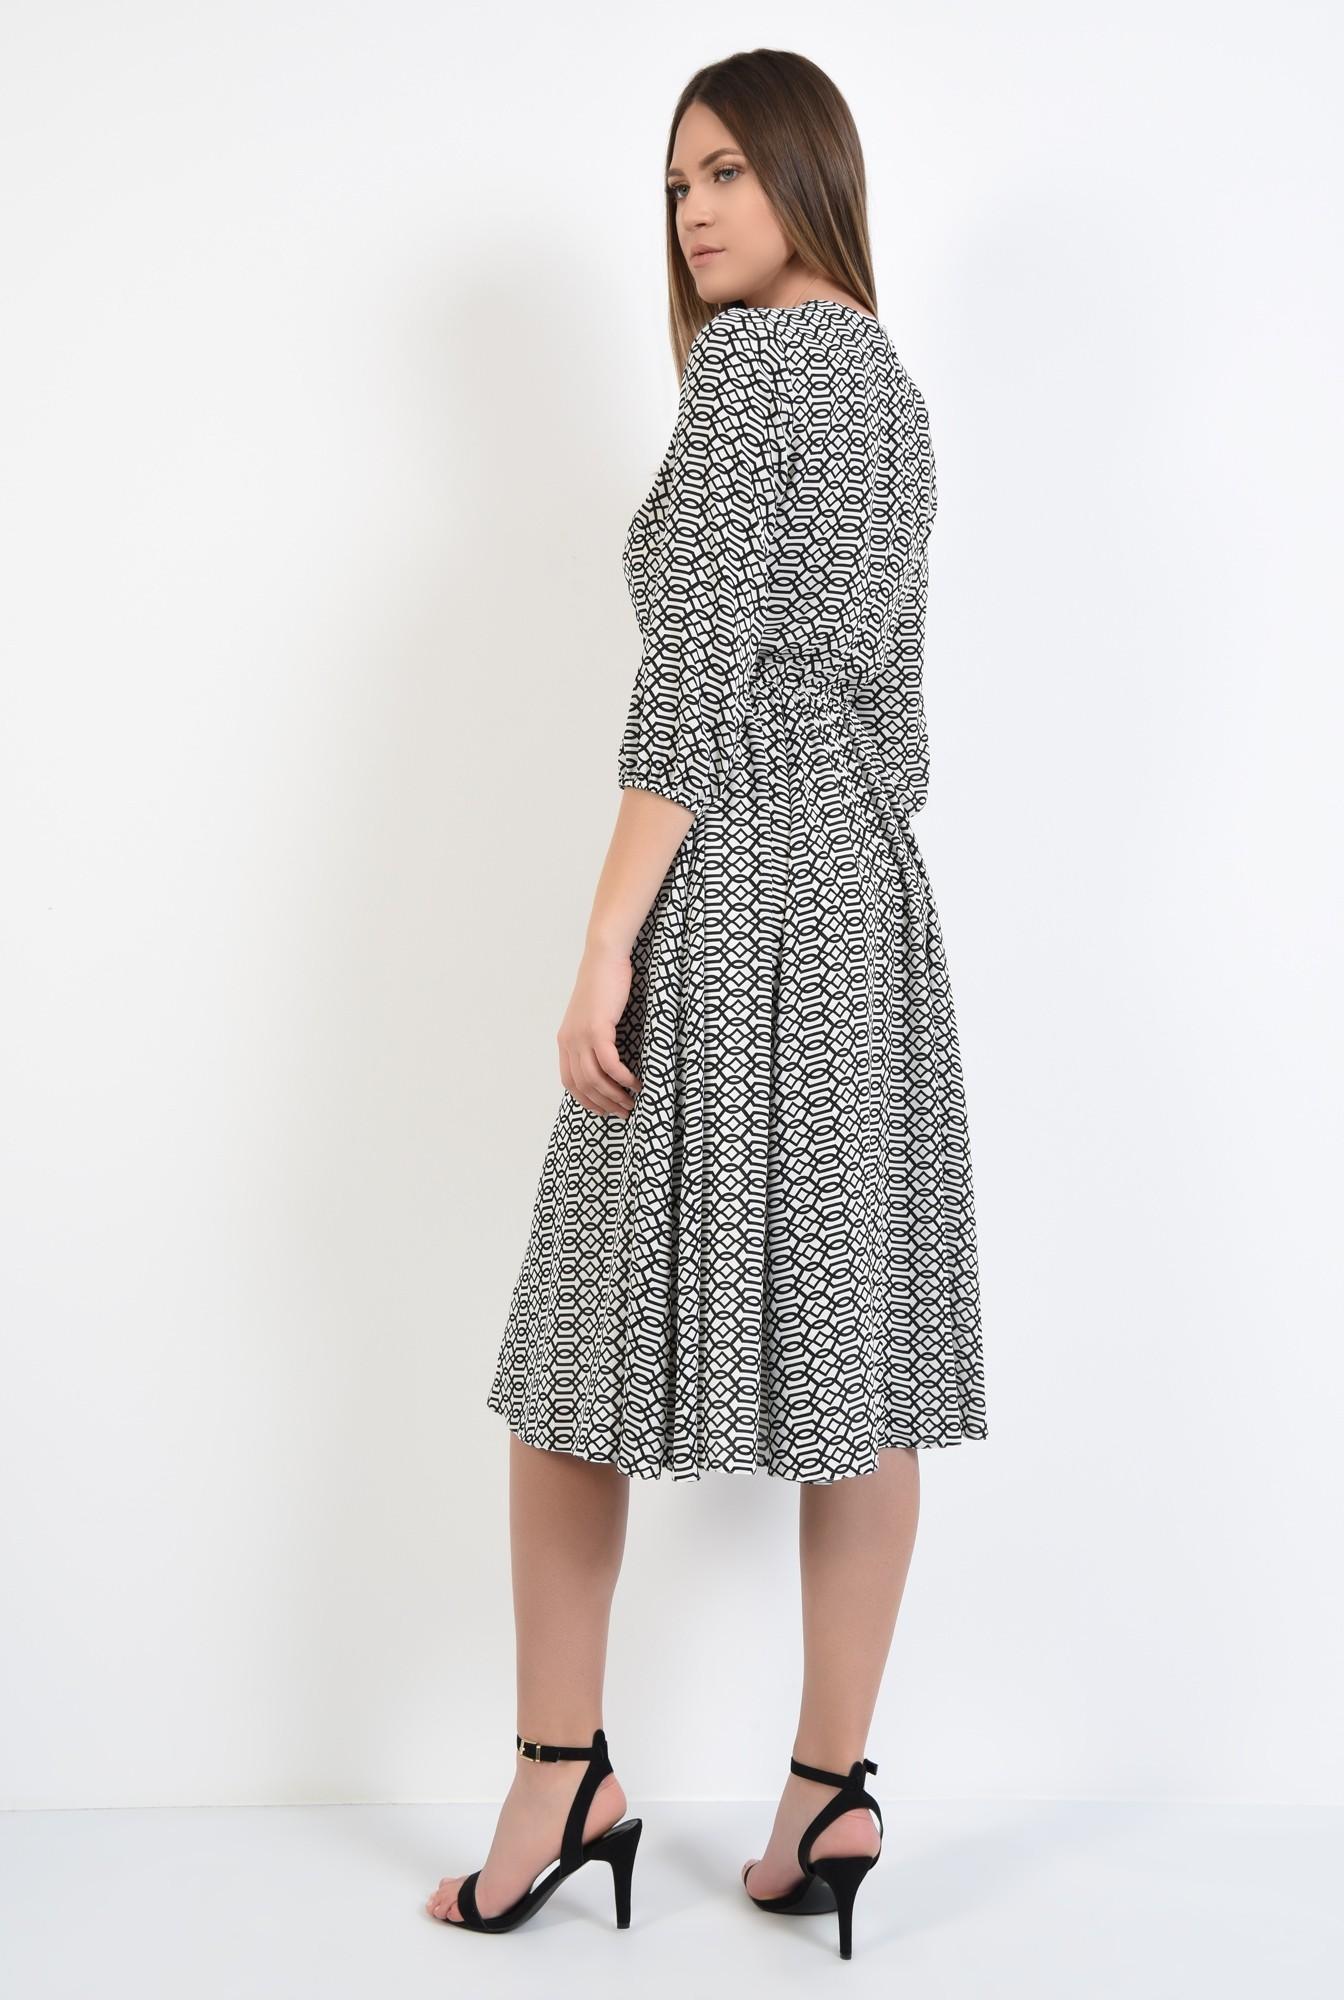 1 - 360 - rochie imprimata, anchior petrecut, maneci 3/4, elastic la talie